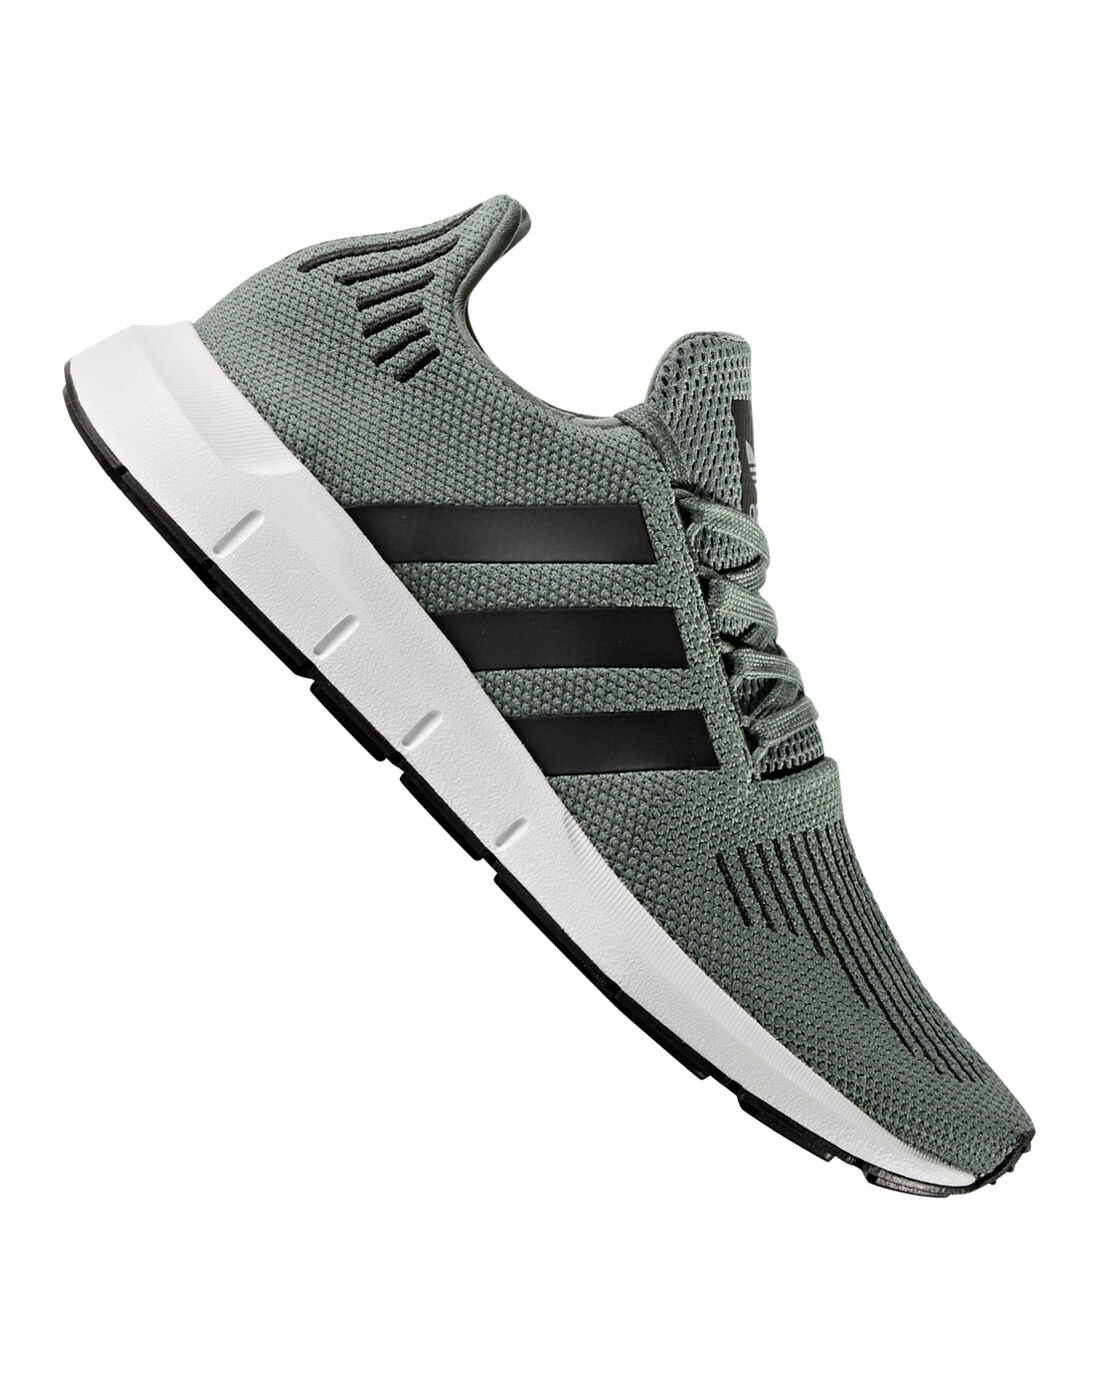 adidas Originals Mens Swift Run   Green   Life Style Sports